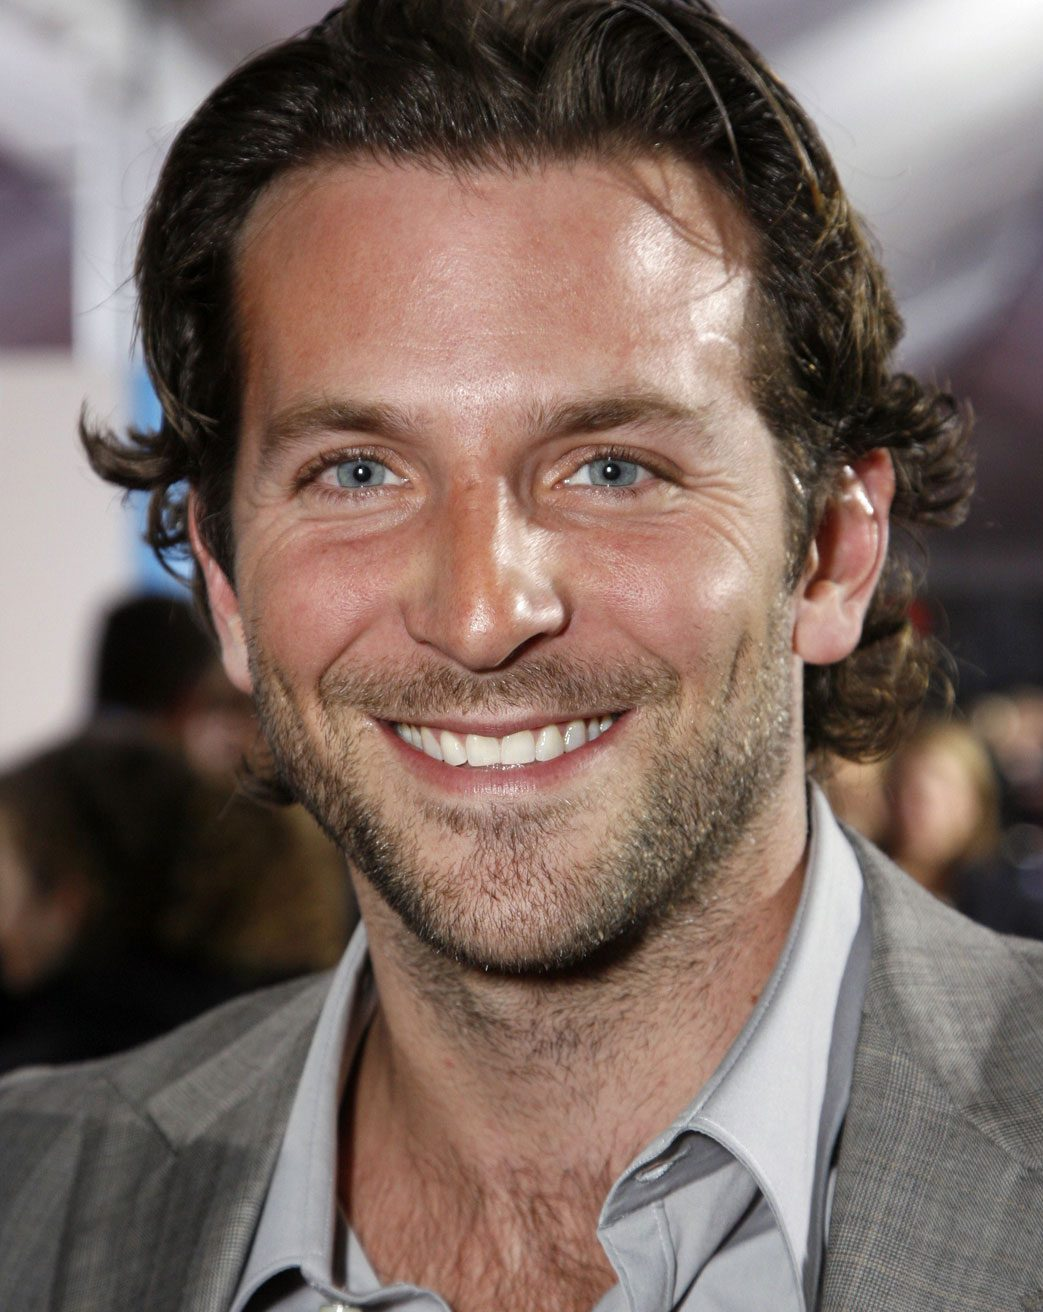 Bradley Cooper smiling